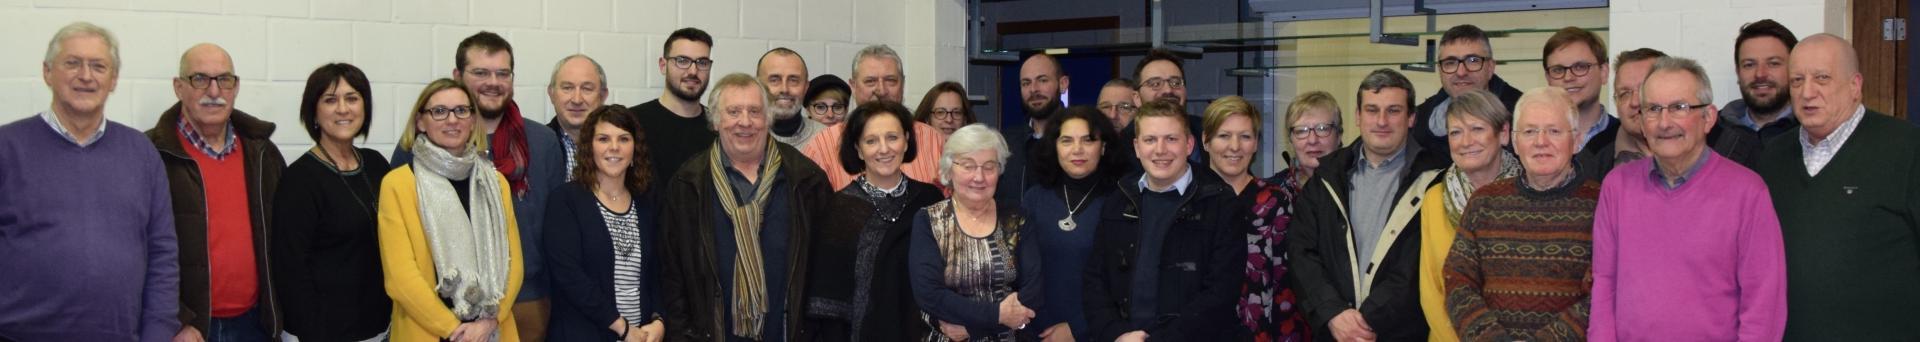 Cldr gerpinnes 2019